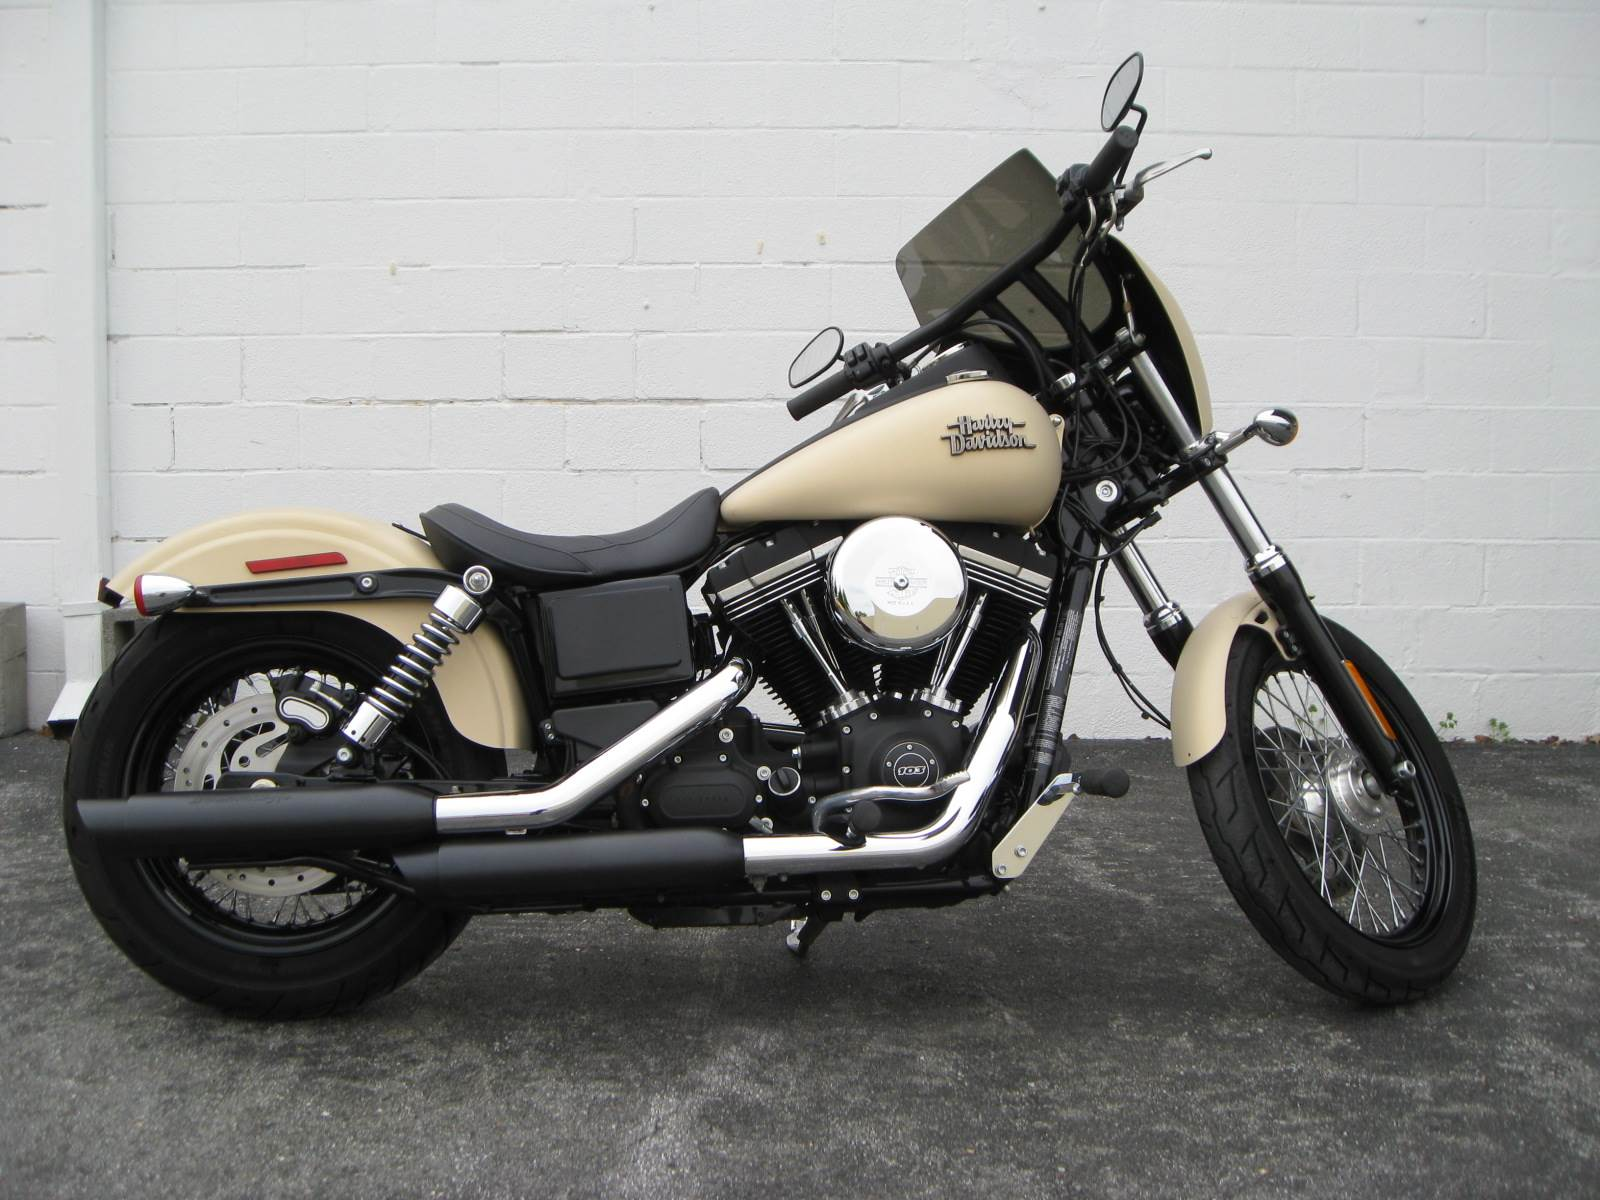 2014 Harley-Davidson Dyna® Street Bob® in Gaithersburg, Maryland